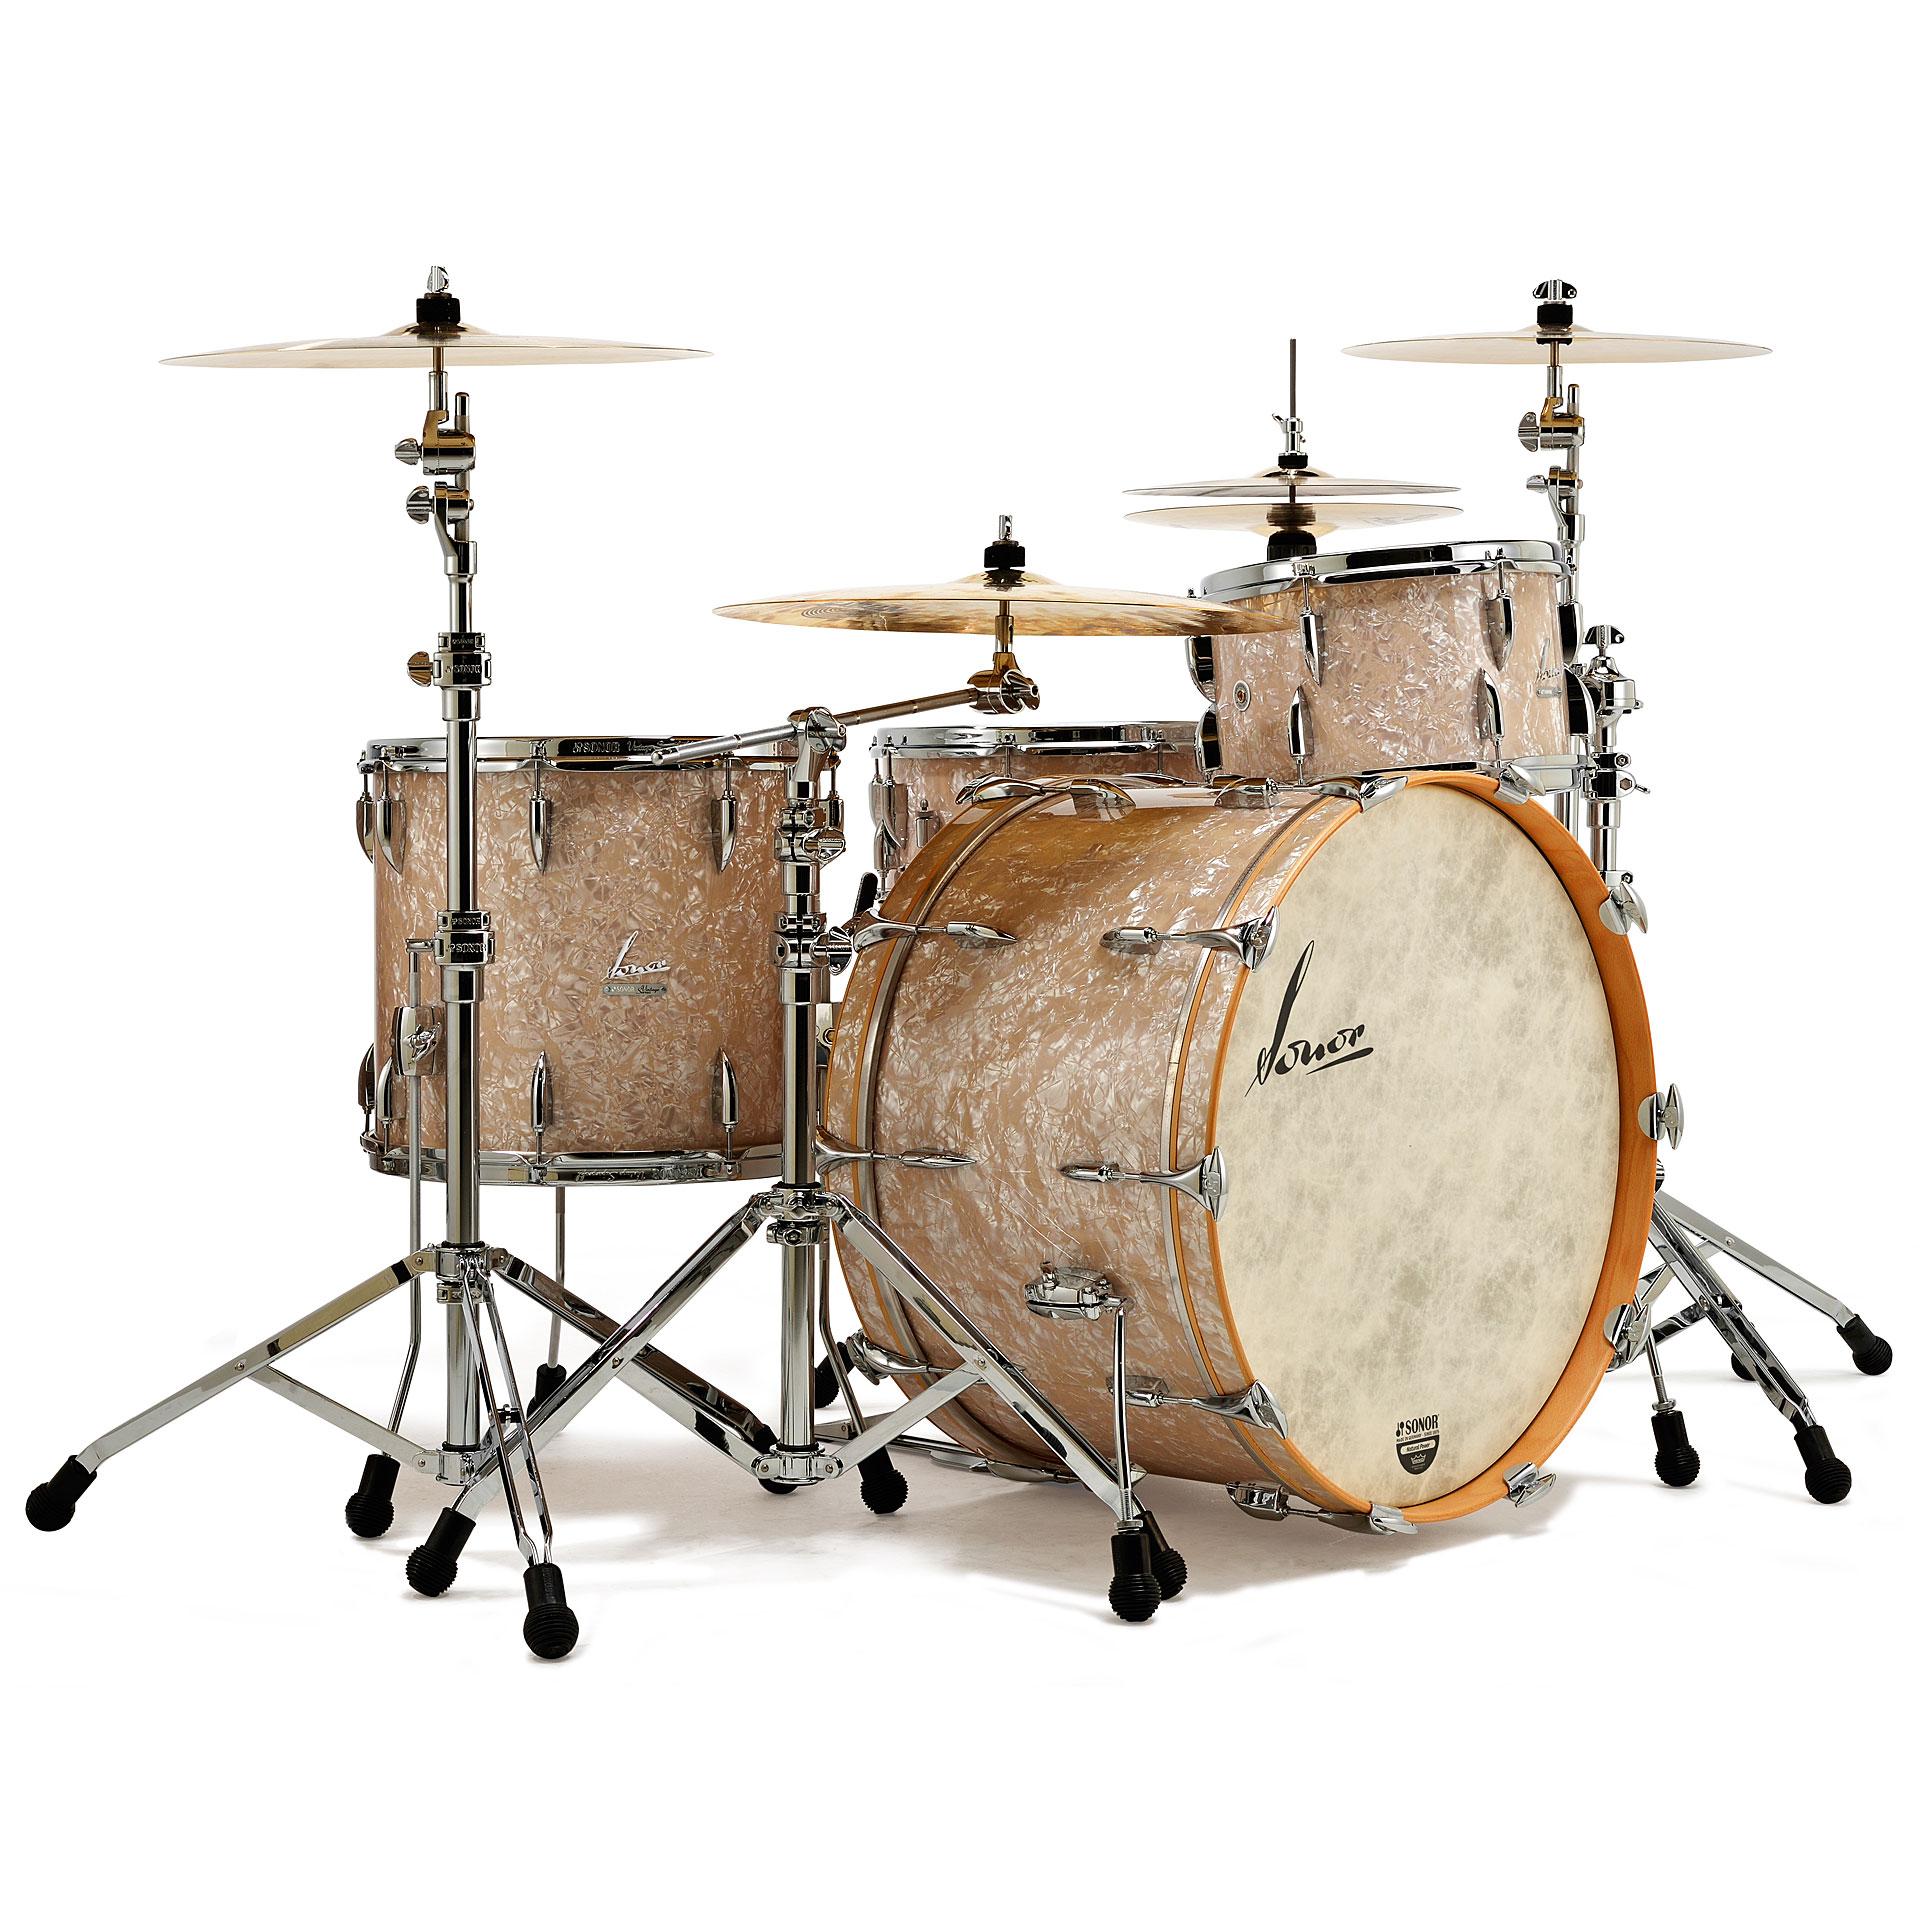 Yamaha Custom Drums With Floor Tom On Stand